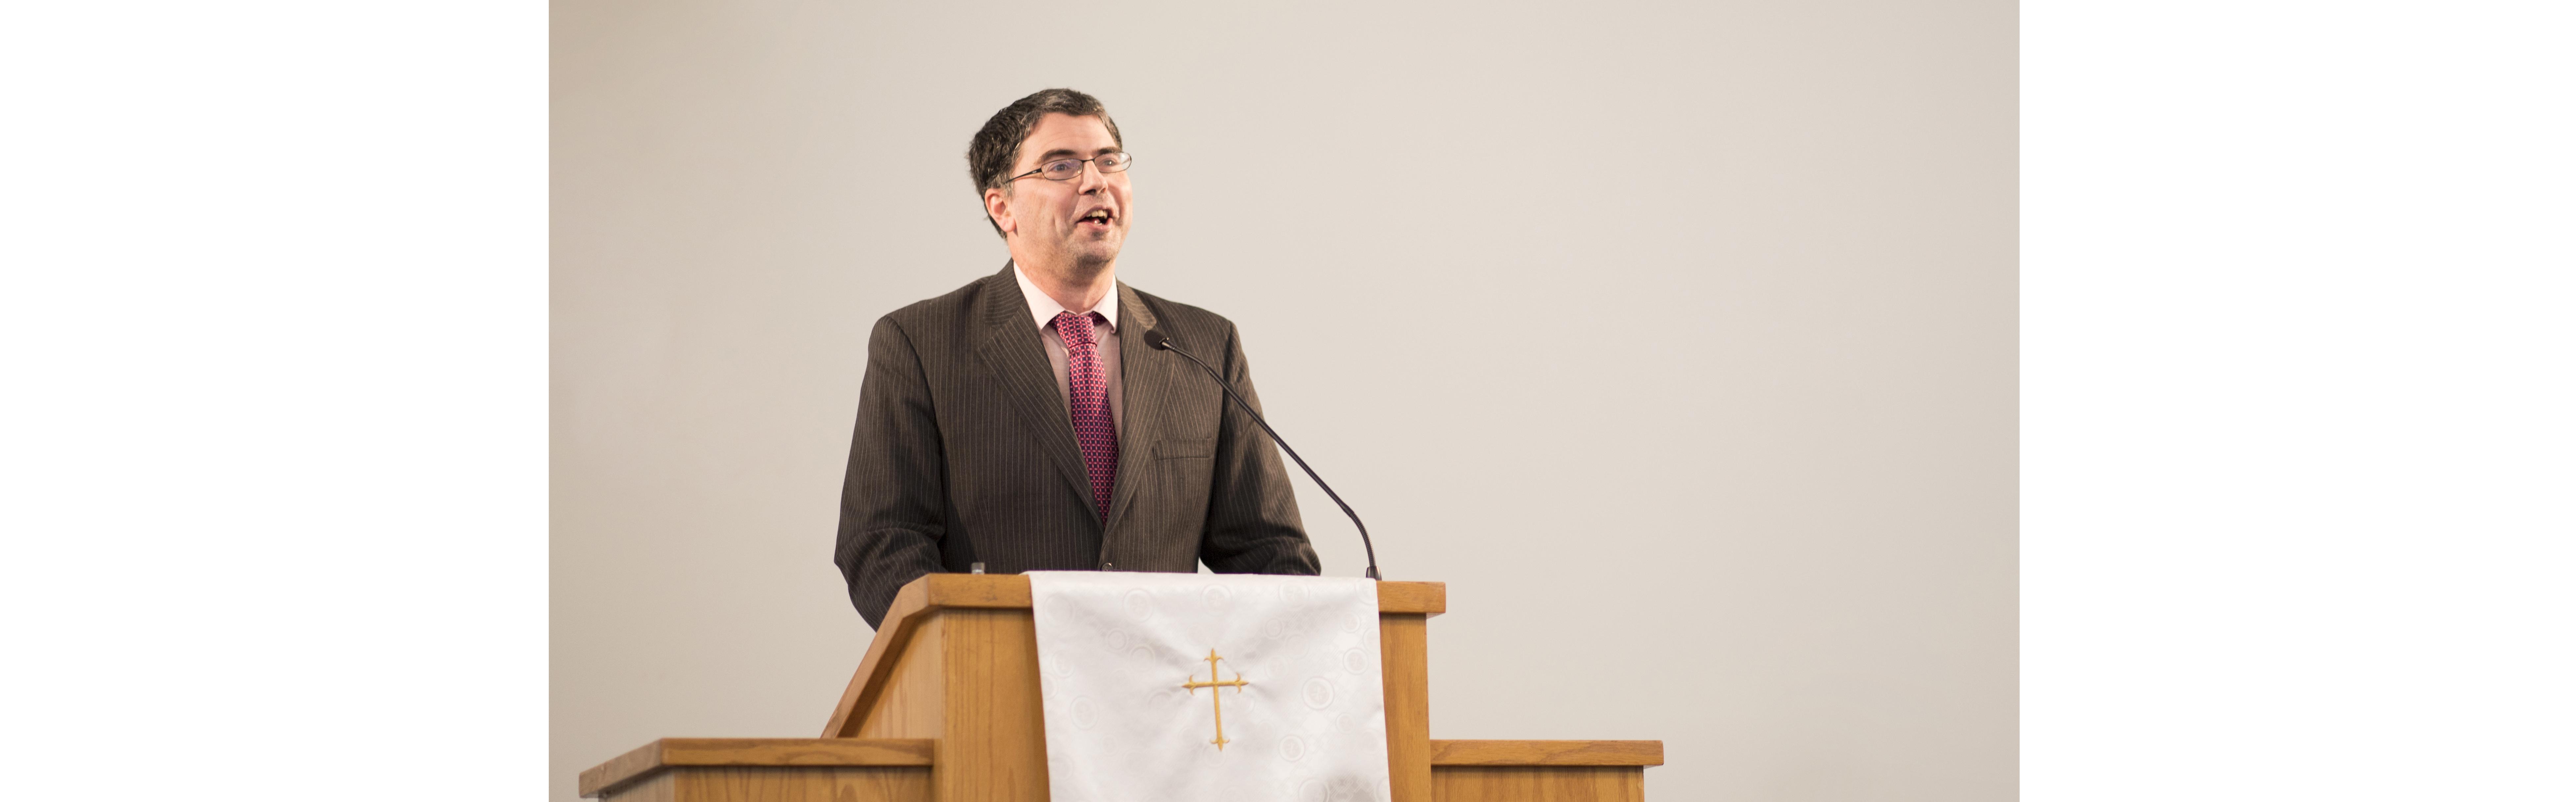 Pastor Phillip_newratio